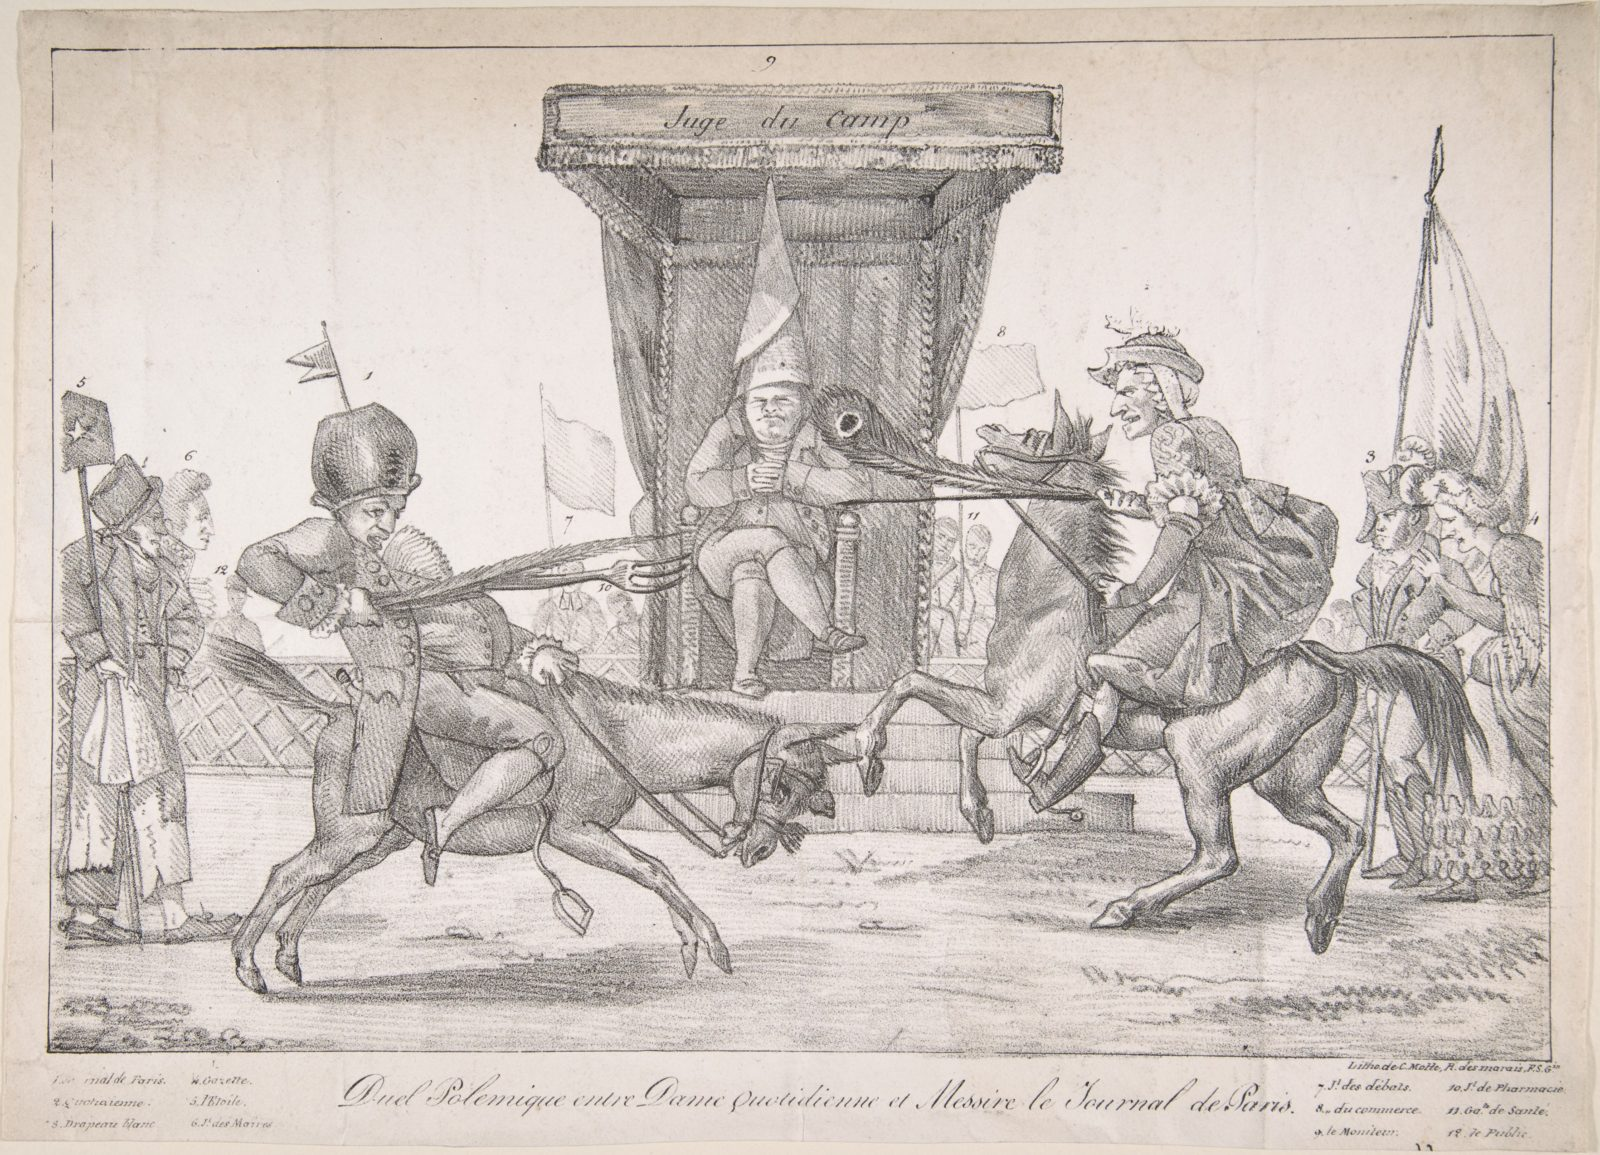 Polemical Duel between Lady Quotidienne and Sir Journal de Paris